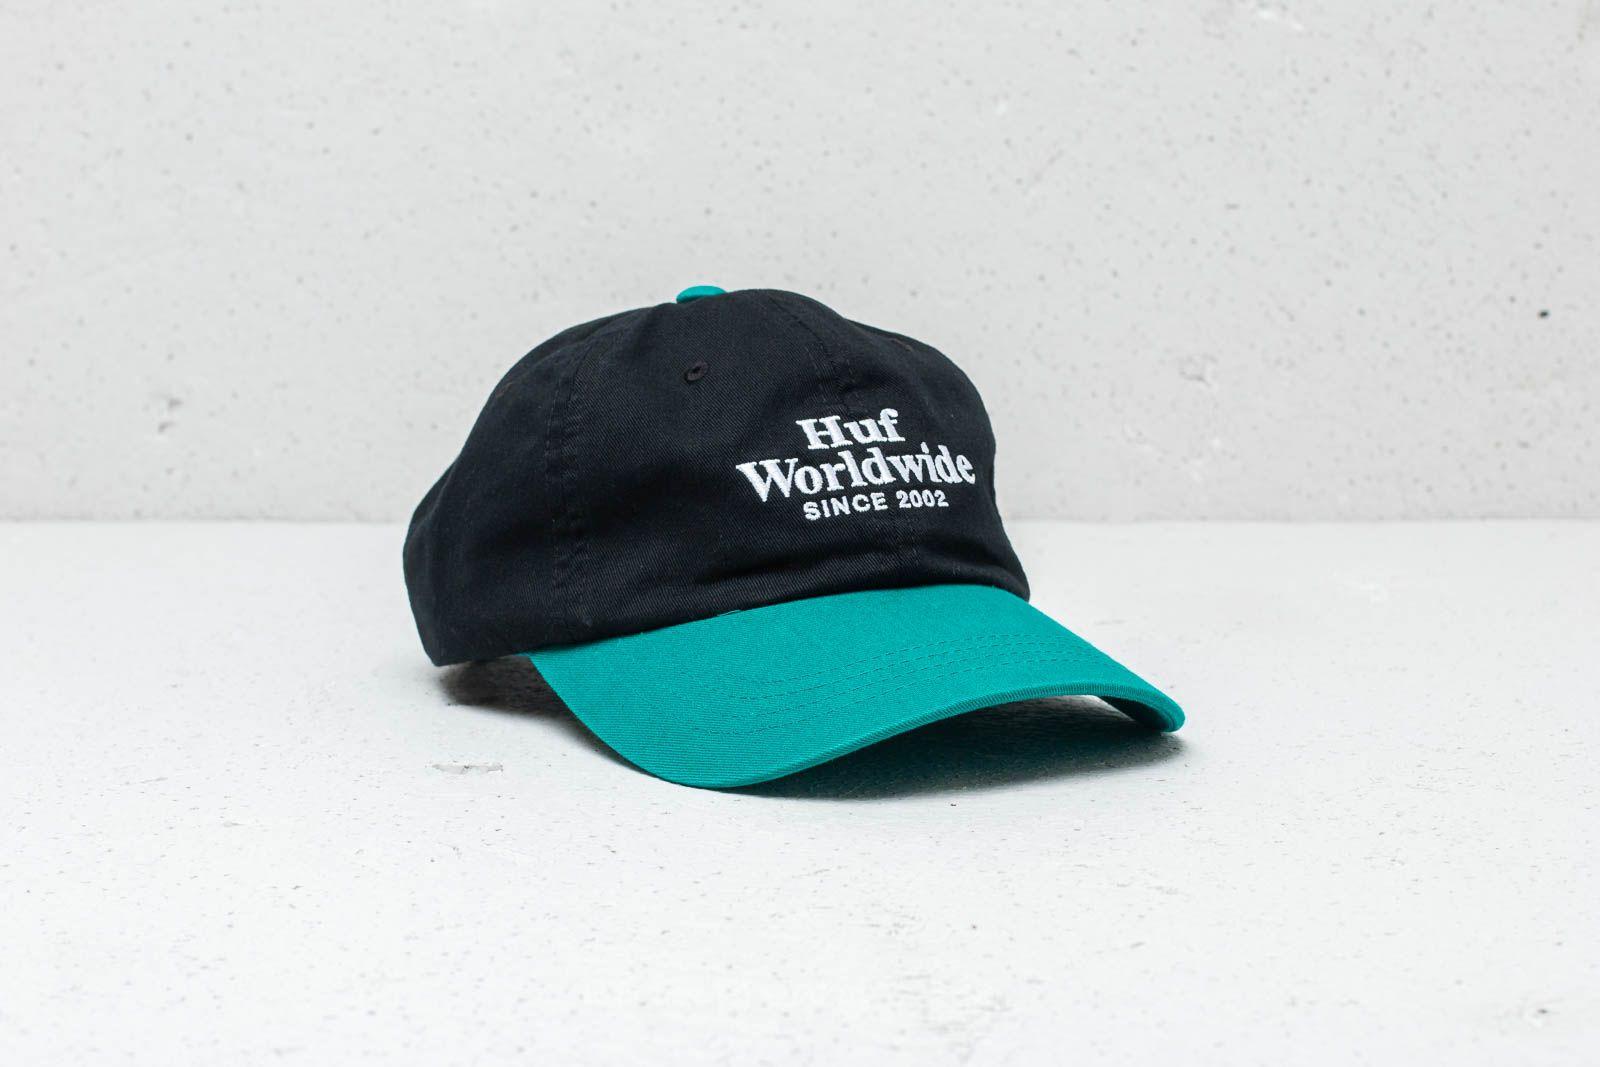 2e1ff5146389b HUF Worldwide CV 6 Panel Cap Black